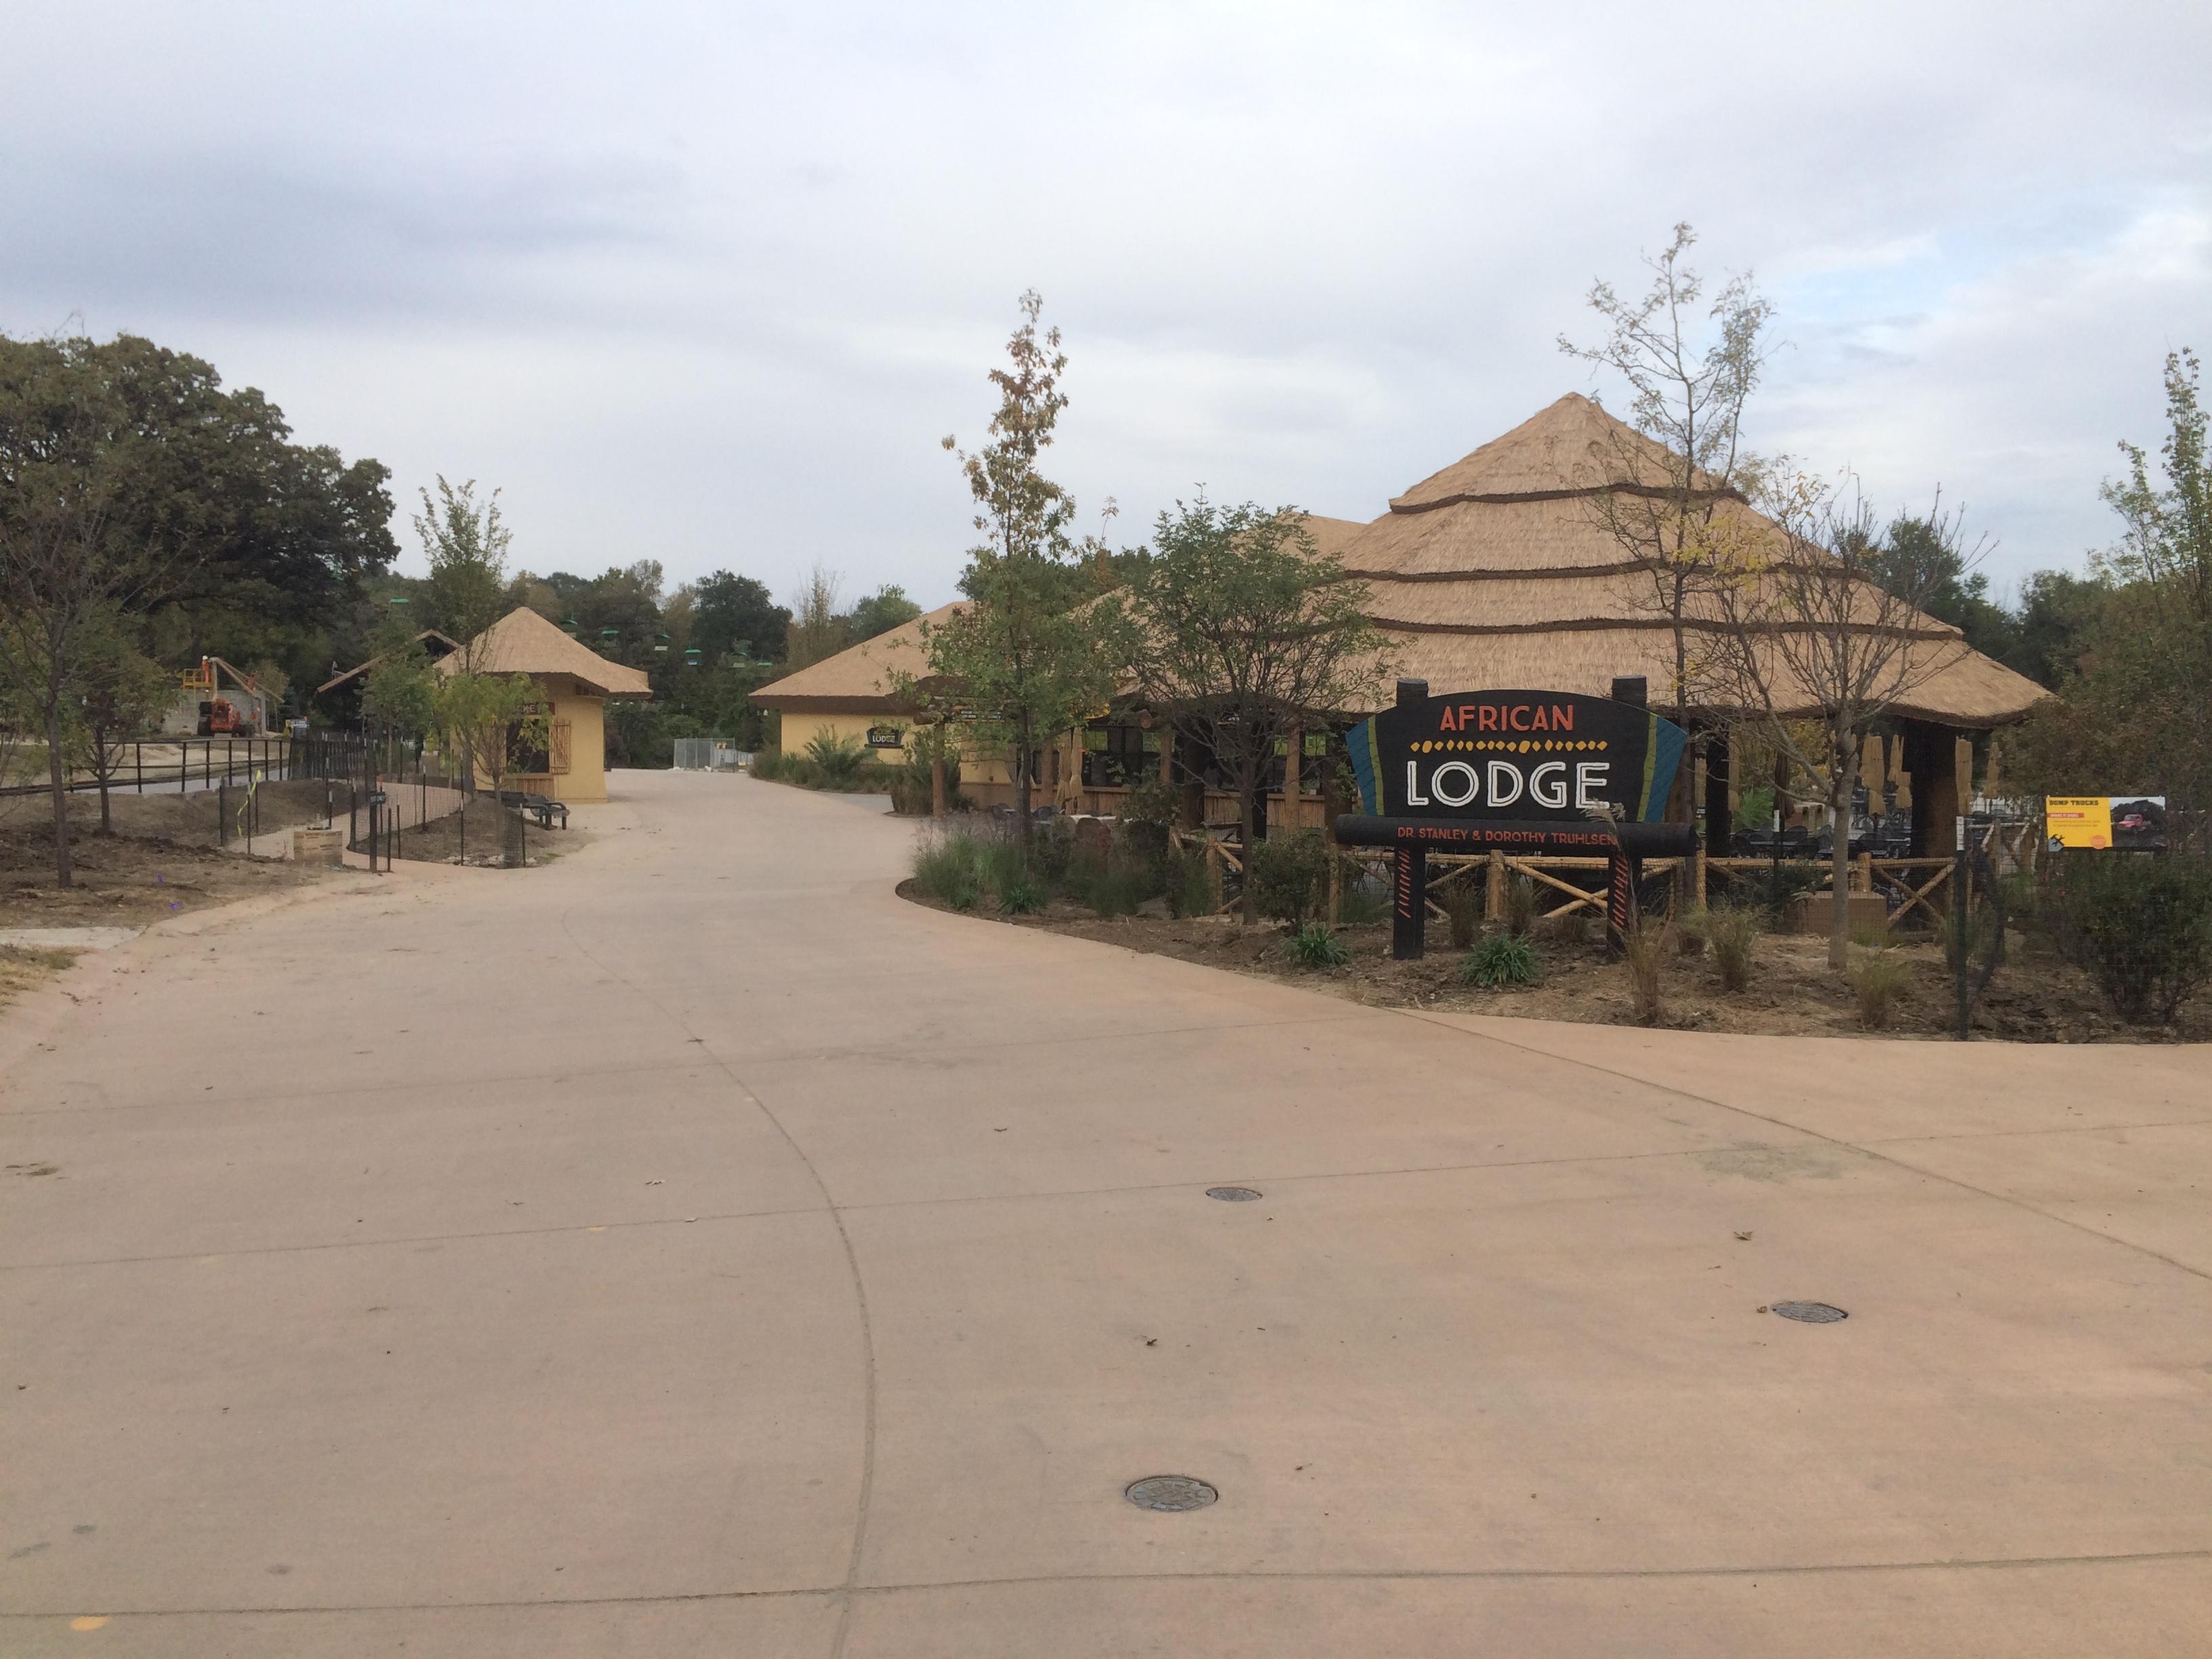 Tusker Grill and Lodge - African Grasslands Henry Doorly Zoo Omaha Nebraska